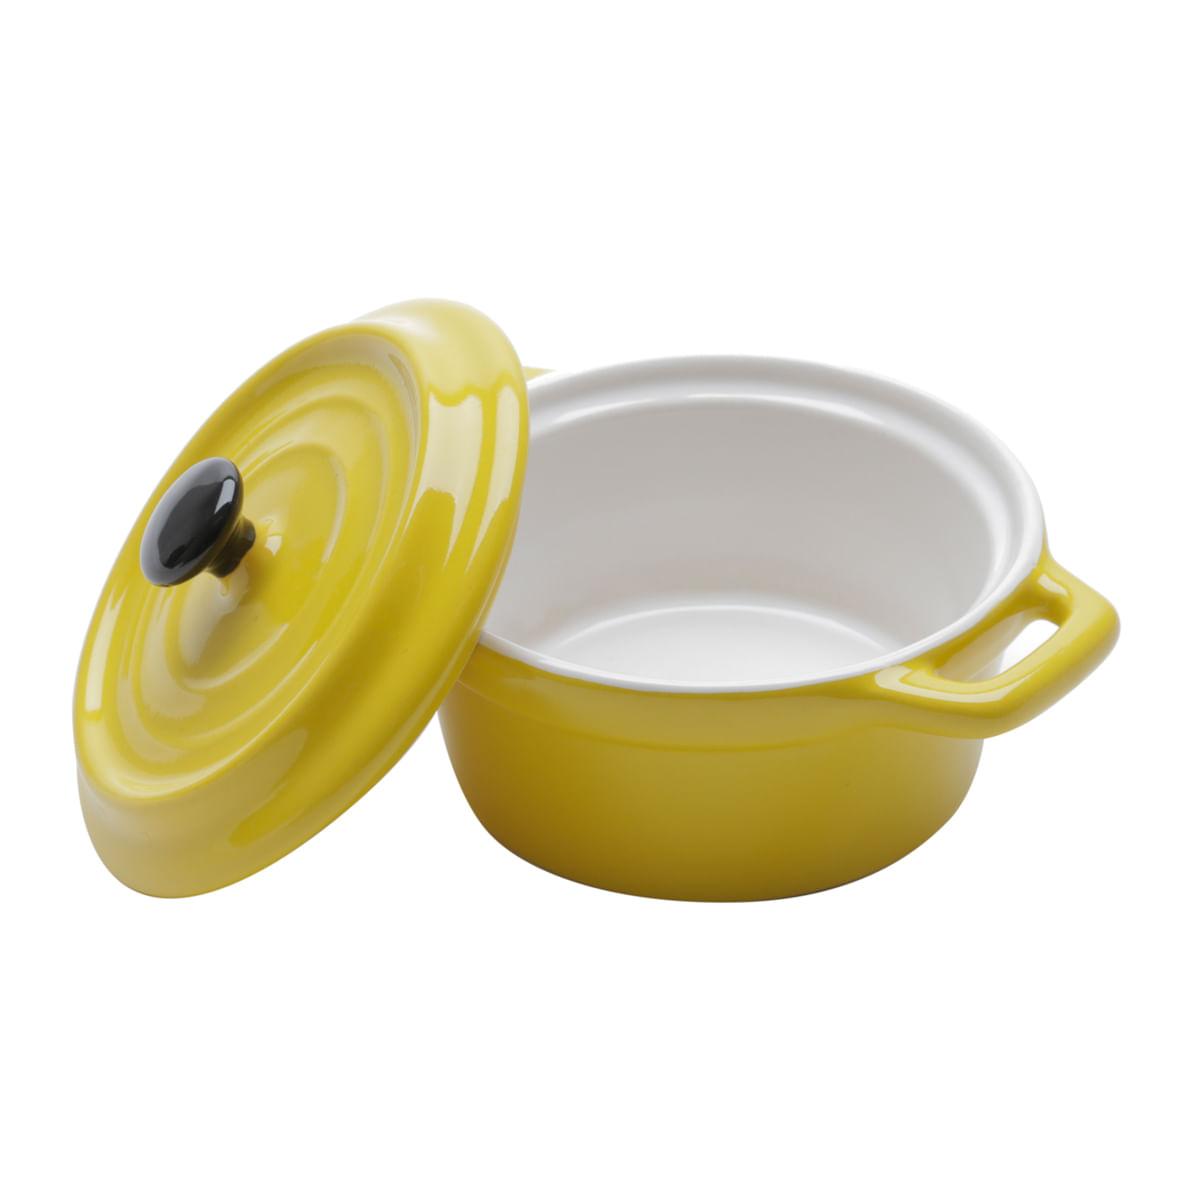 Mini caçarola redonda de porcelana amarela - 12,7cm